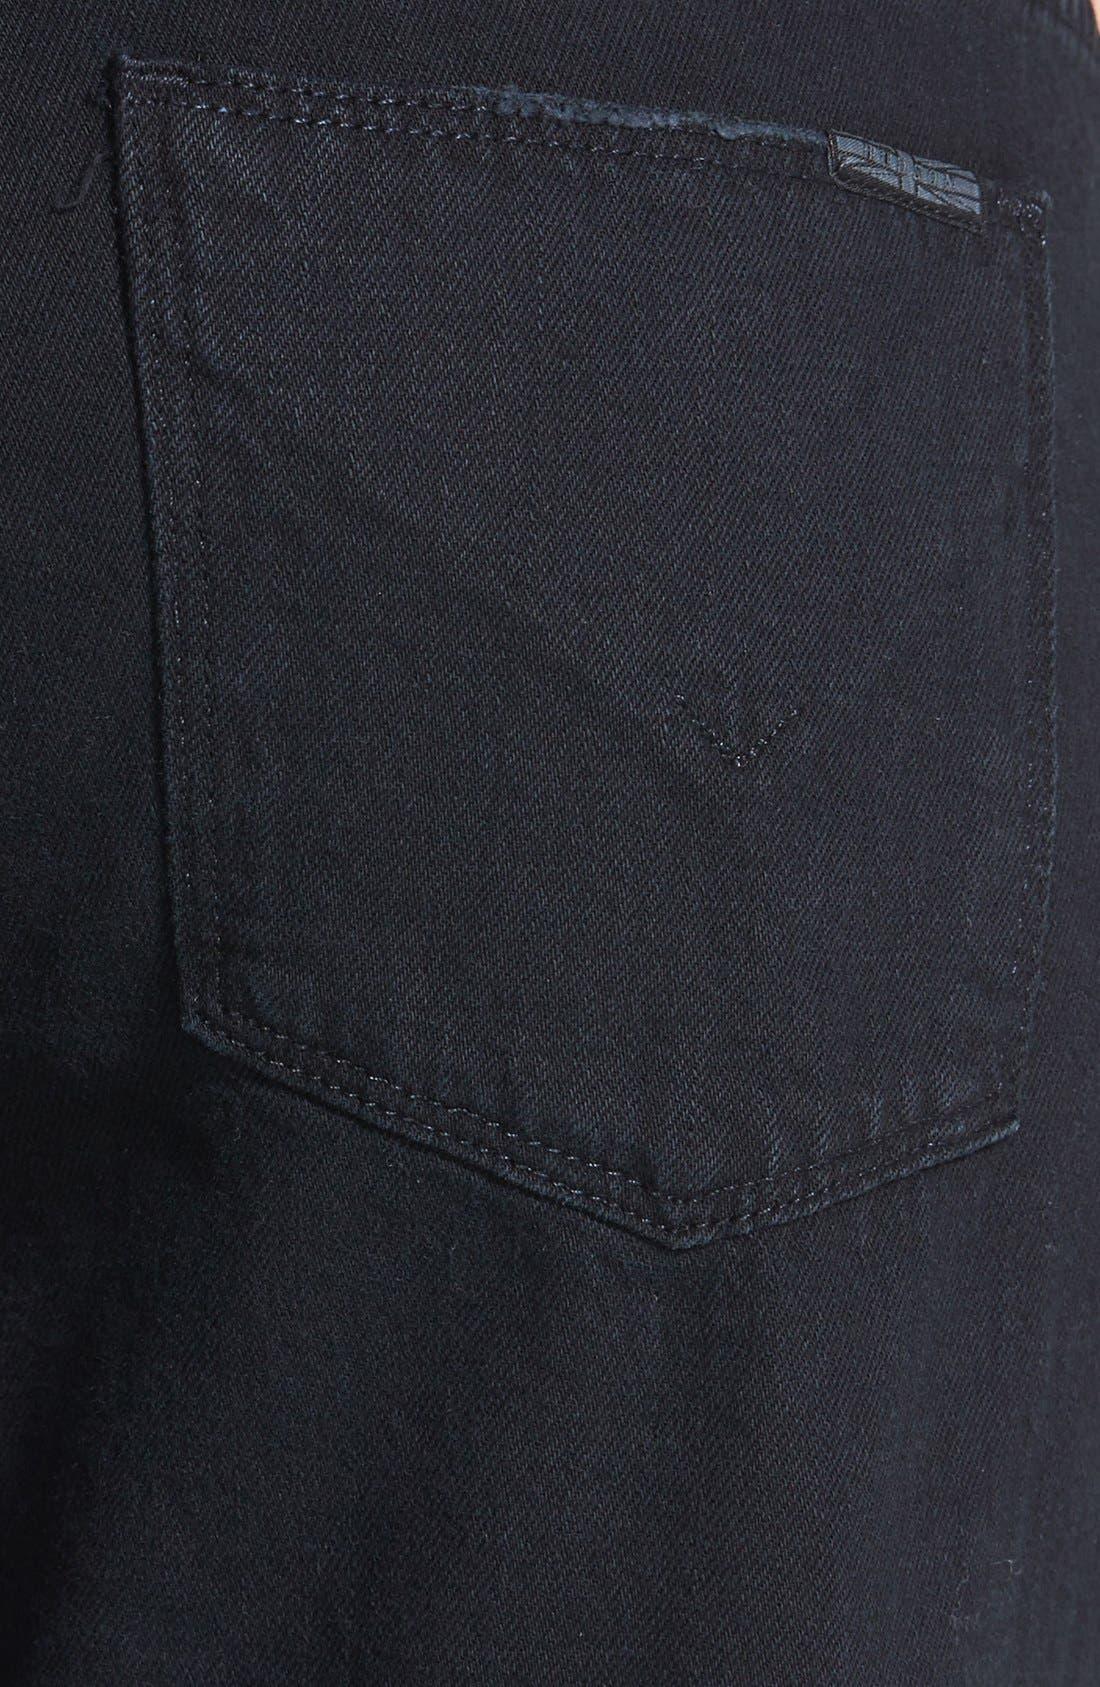 'Leigh' Boyfriend Jeans,                             Alternate thumbnail 3, color,                             001